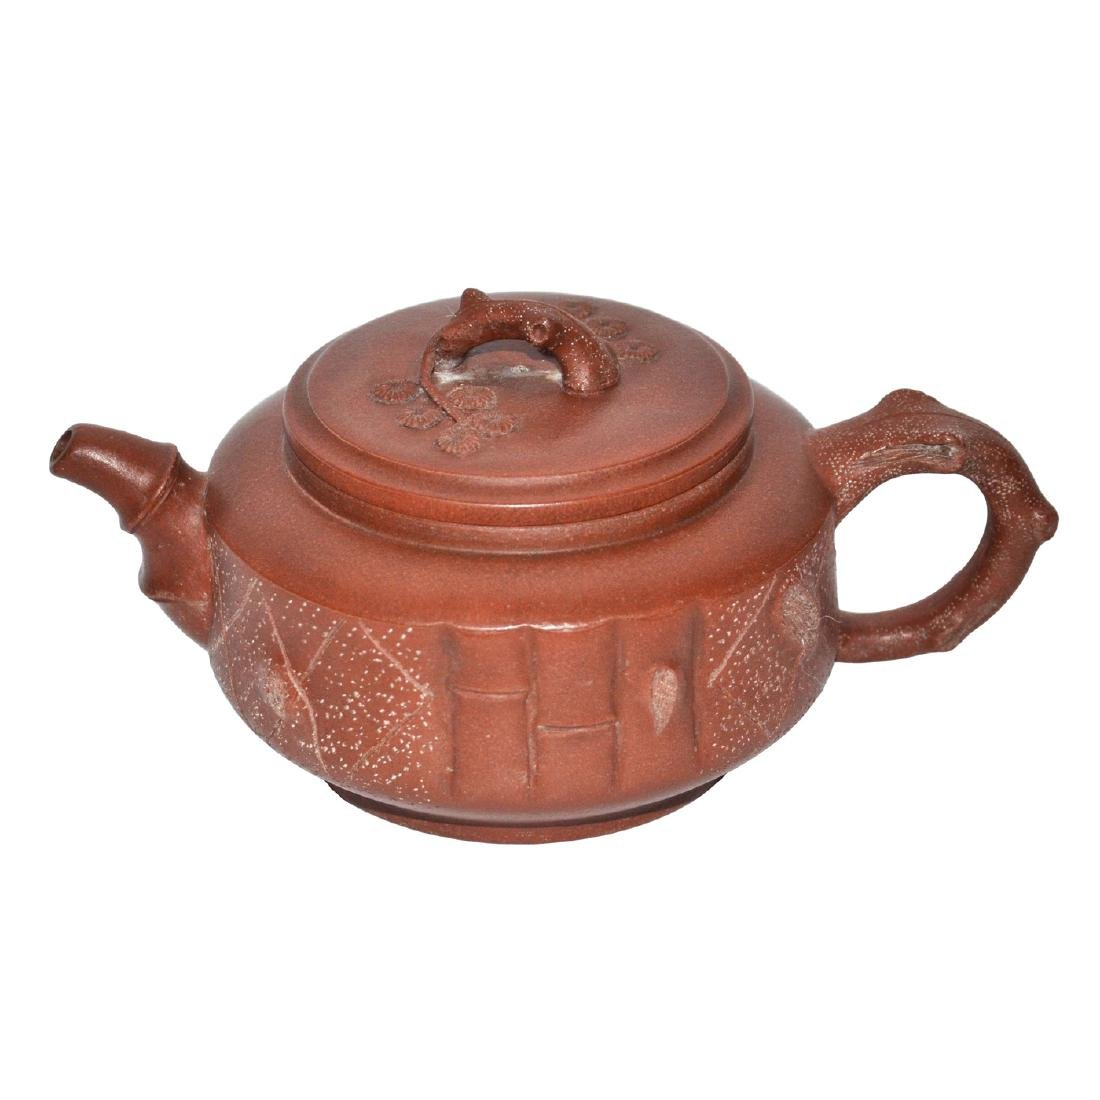 Shao Zhenglai, Zisha Burl Compressed Teapot with Bamboo